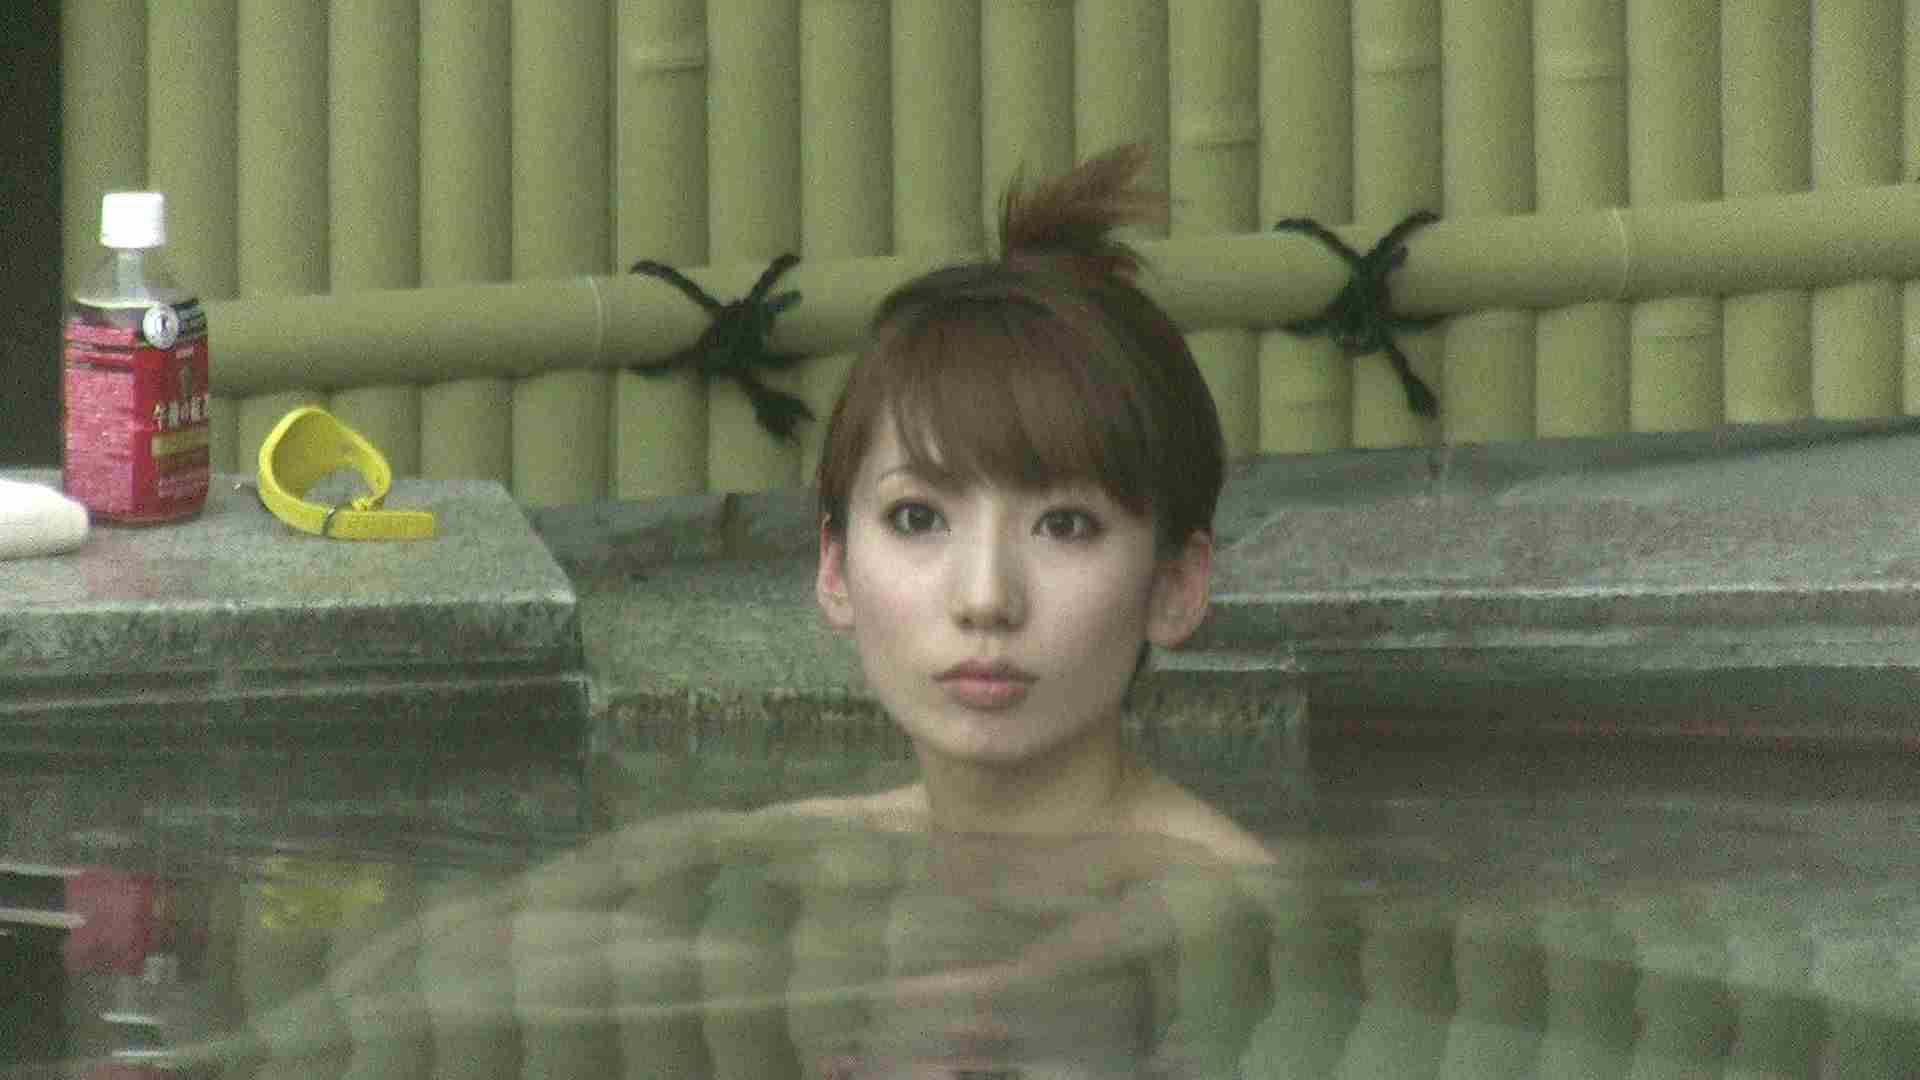 Aquaな露天風呂Vol.208 0  78連発 28